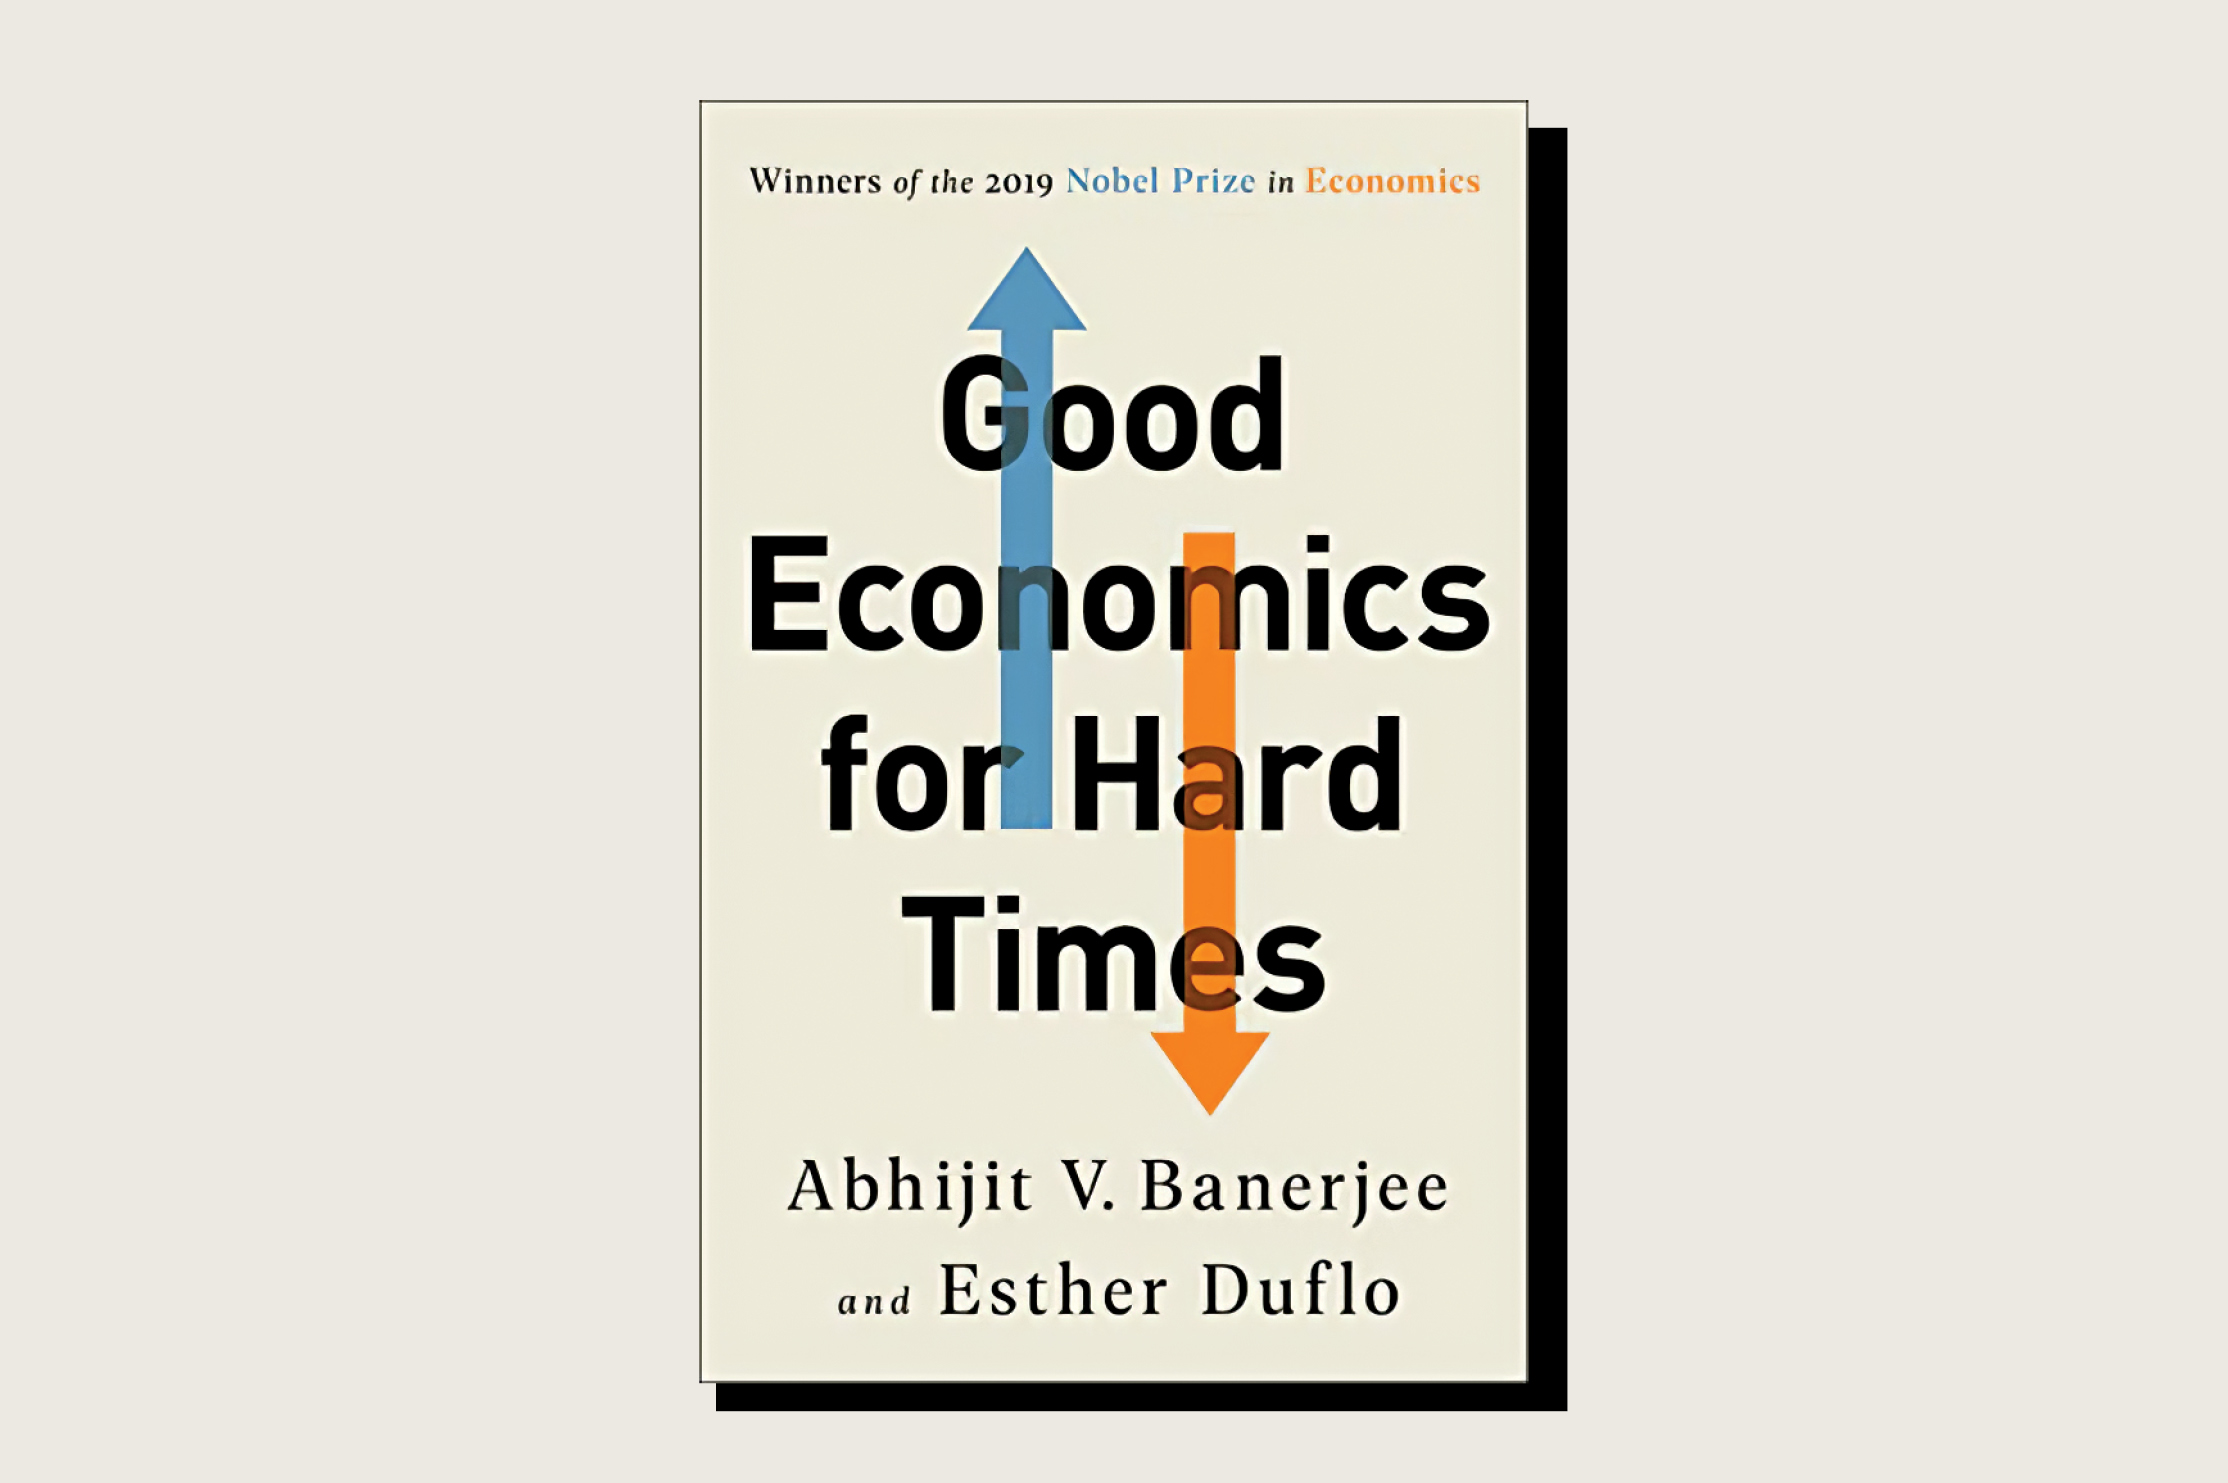 Good Economics for Hard Times, Abhijit V. Banerjee and Esther Duflo, PublicAffairs, 432 pp., .99, November 2019